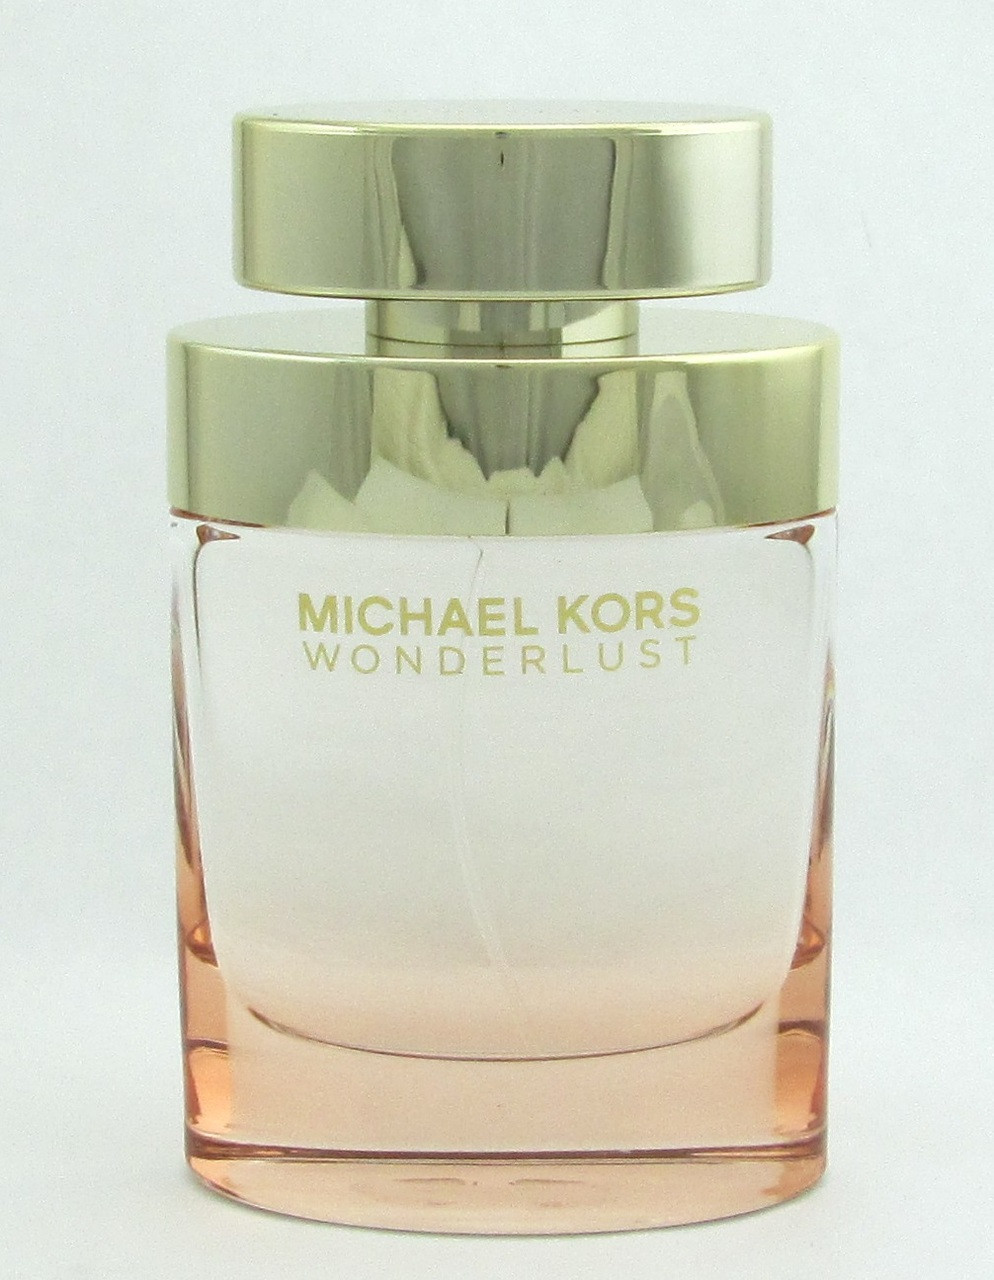 06a6d895f16c Add to Wish List. Click the button below to add the Wonderlust by Michael  Kors Eau De Parfum ...